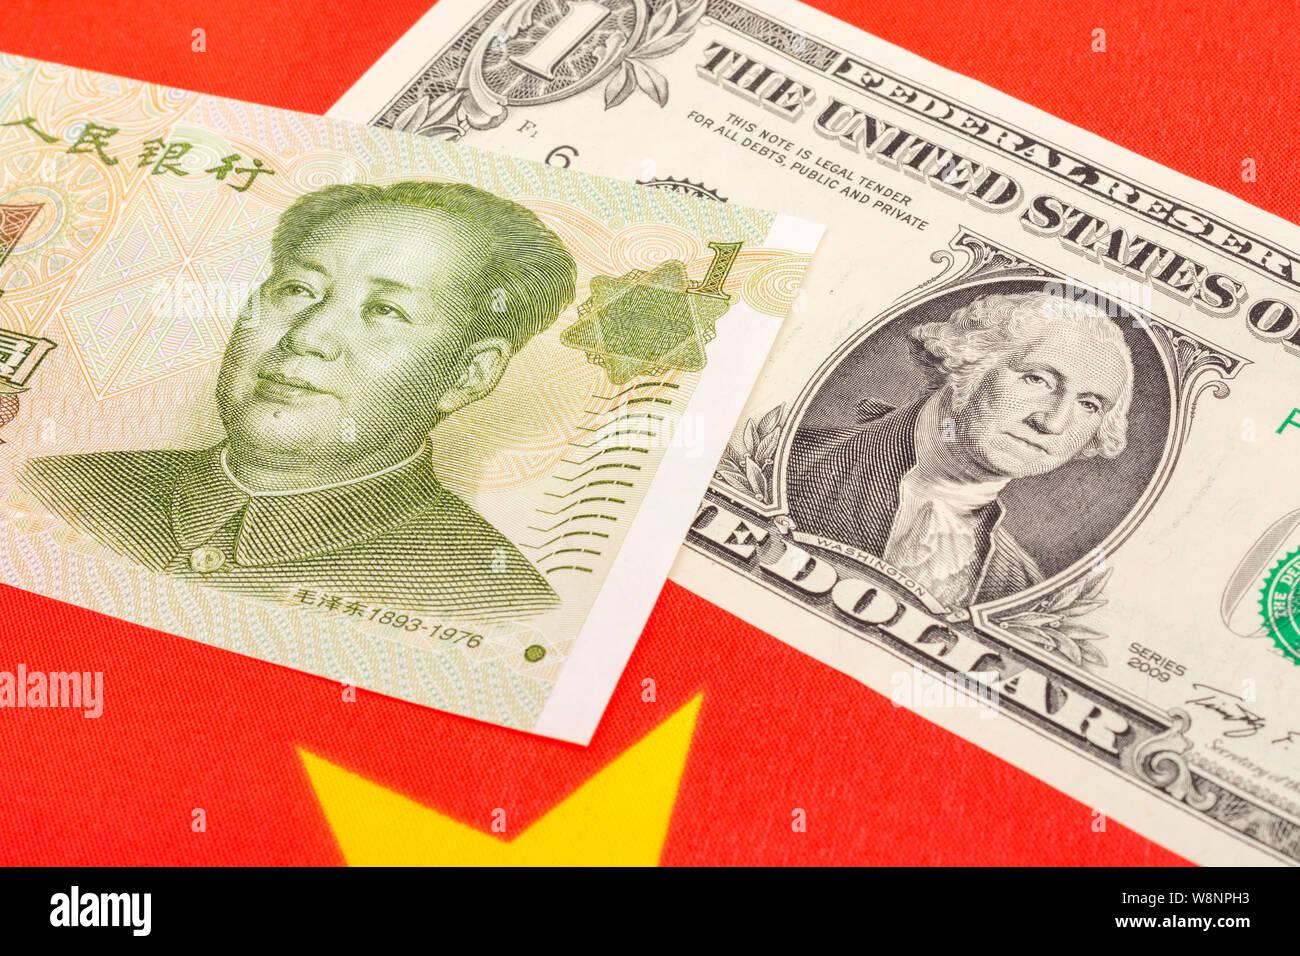 Close Up Shot U S 1 Dollar Bill Banknote Chinese 1 Yuan Renminbi China Flag Metaphor Us China Trade War Currency War Currency Manipulation Stock Photo Alamy